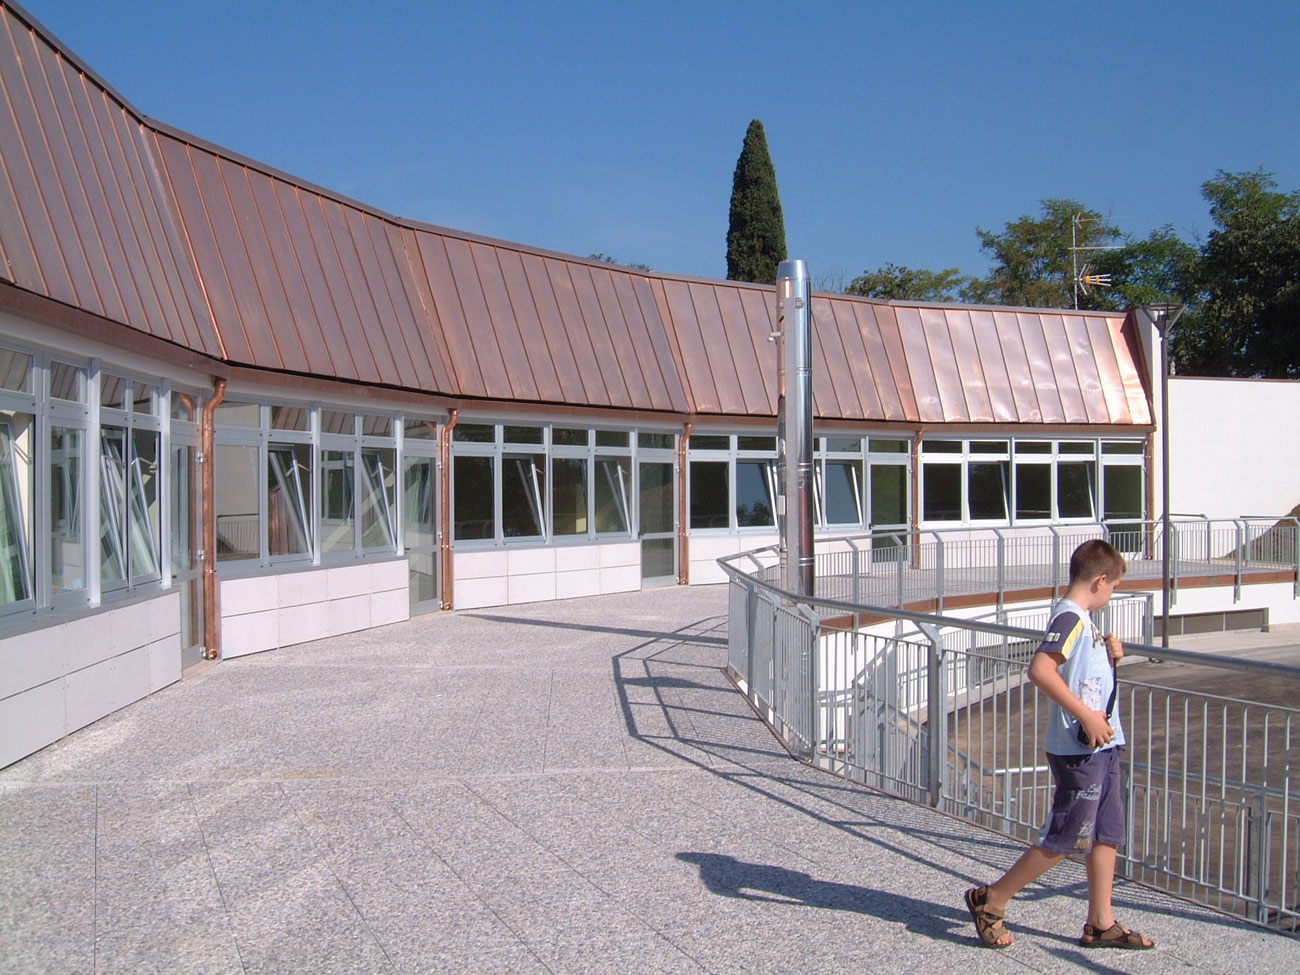 07-Campus-Scolastico-Monzambano-AIACE-srl